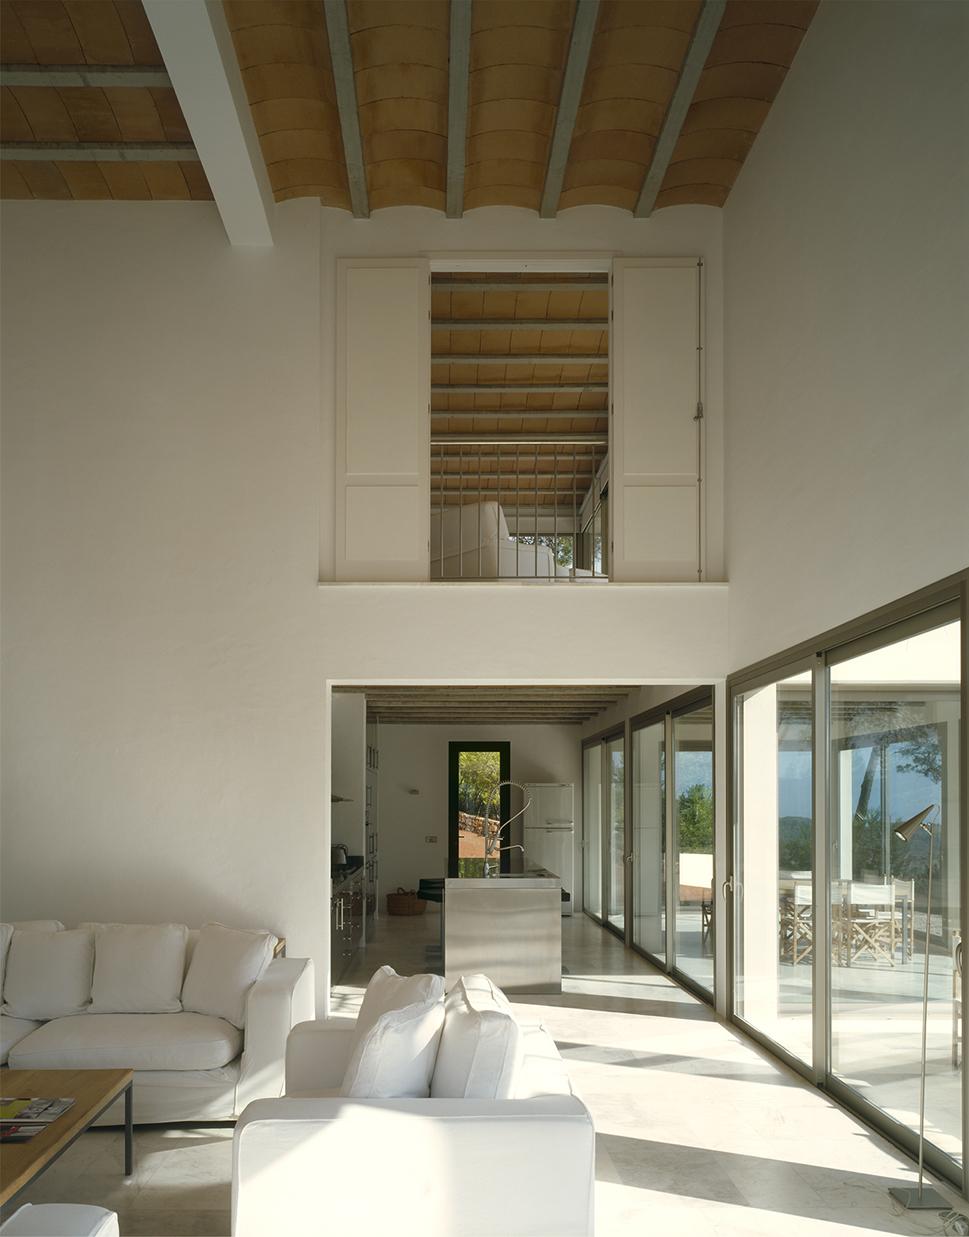 3 Morna Valley, Ibiza - Lounge